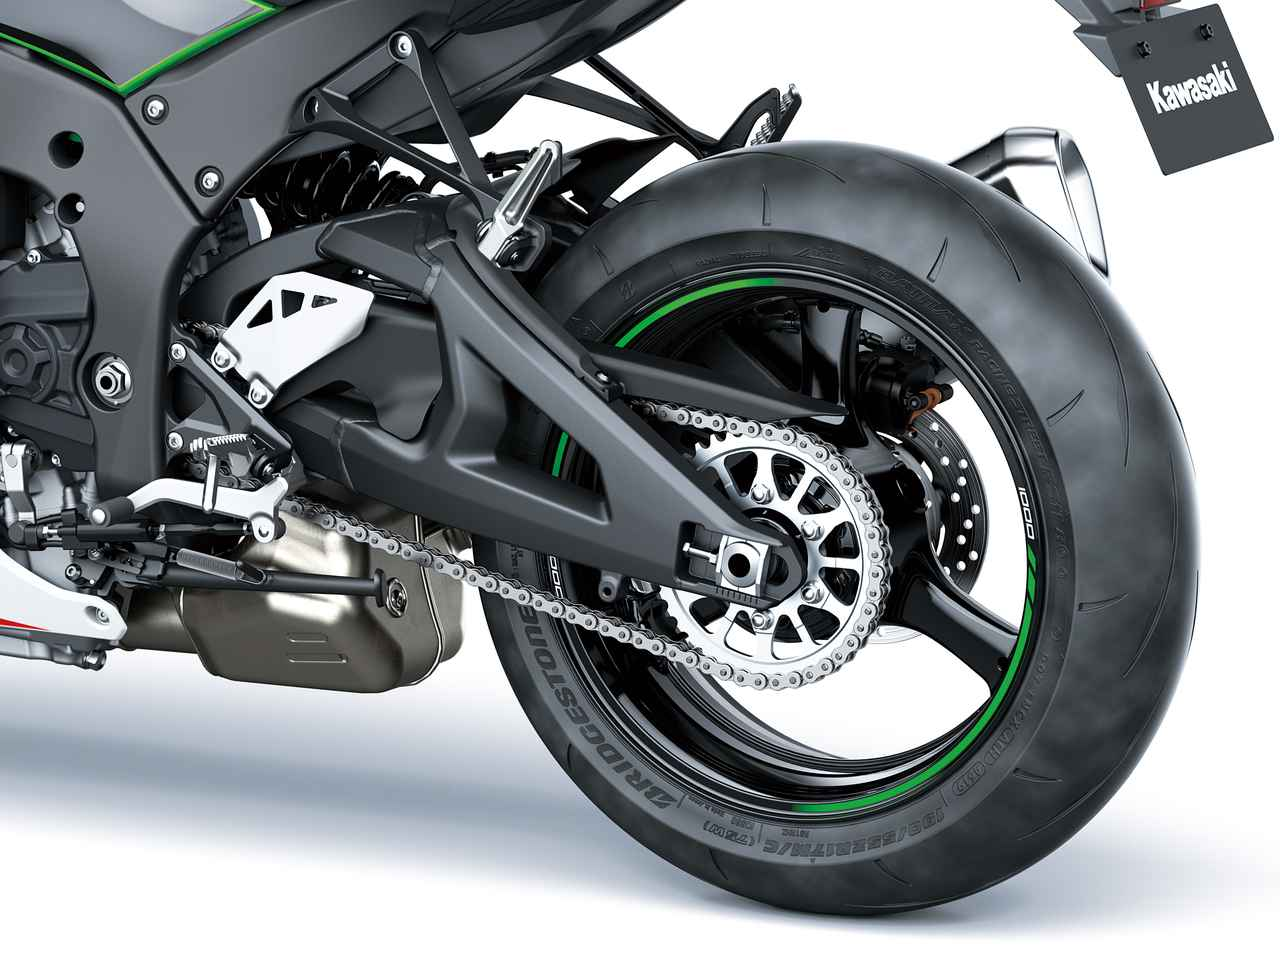 Images : 32番目の画像 - 【写真36枚】カワサキ 新型 Ninja ZX-10R/Ninja ZX-10RR - webオートバイ